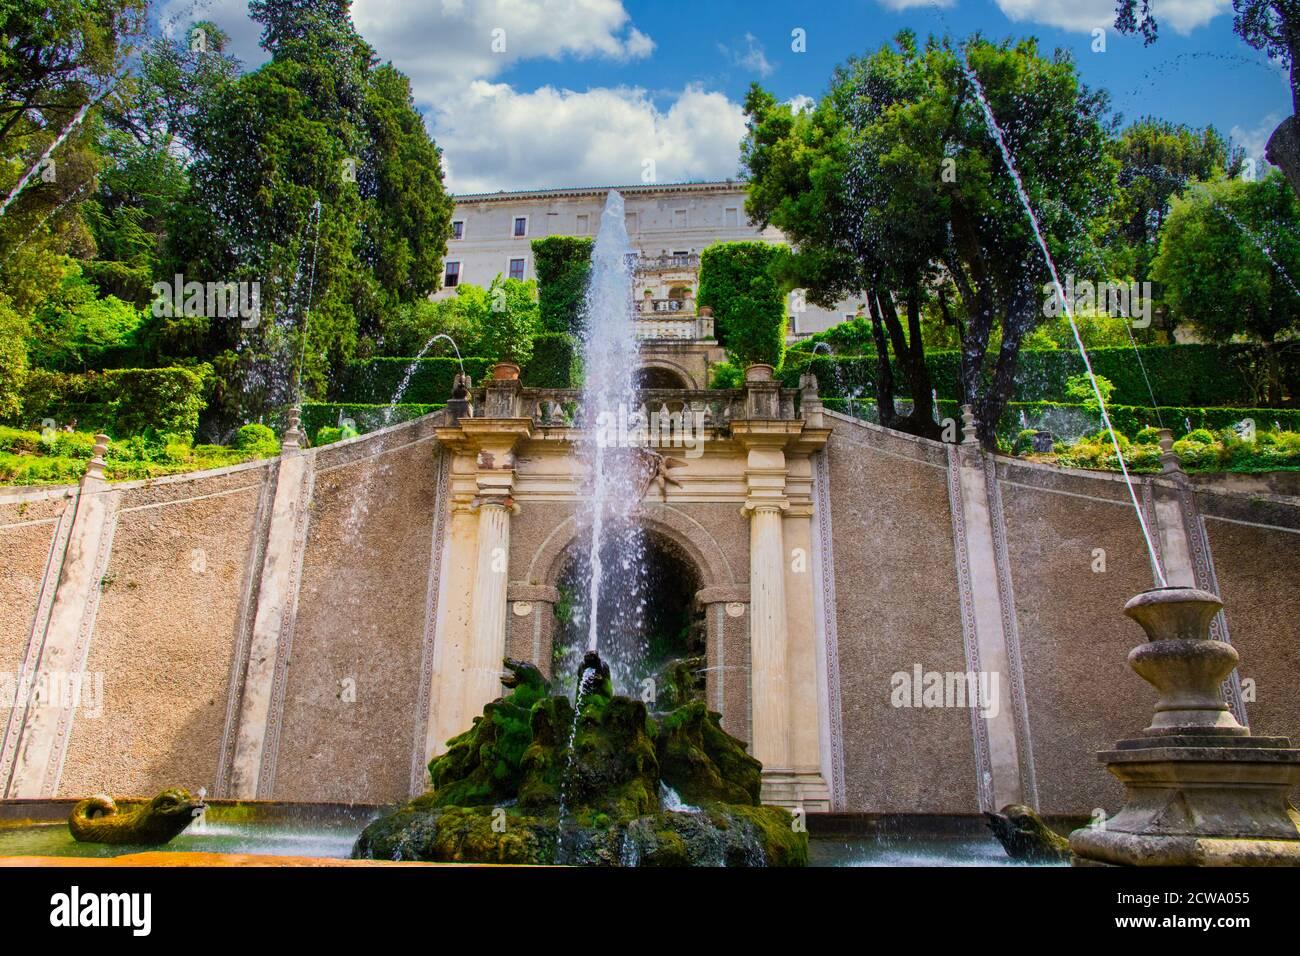 Brunnen in der Villa D'Este in Latium Italien Stockfoto